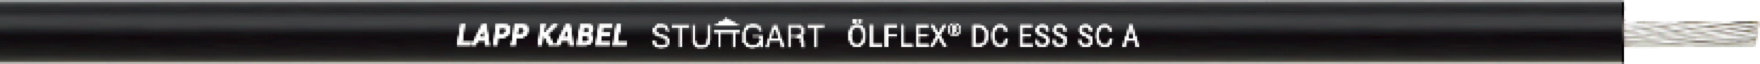 ÖLFLEX® DC ESS SC A